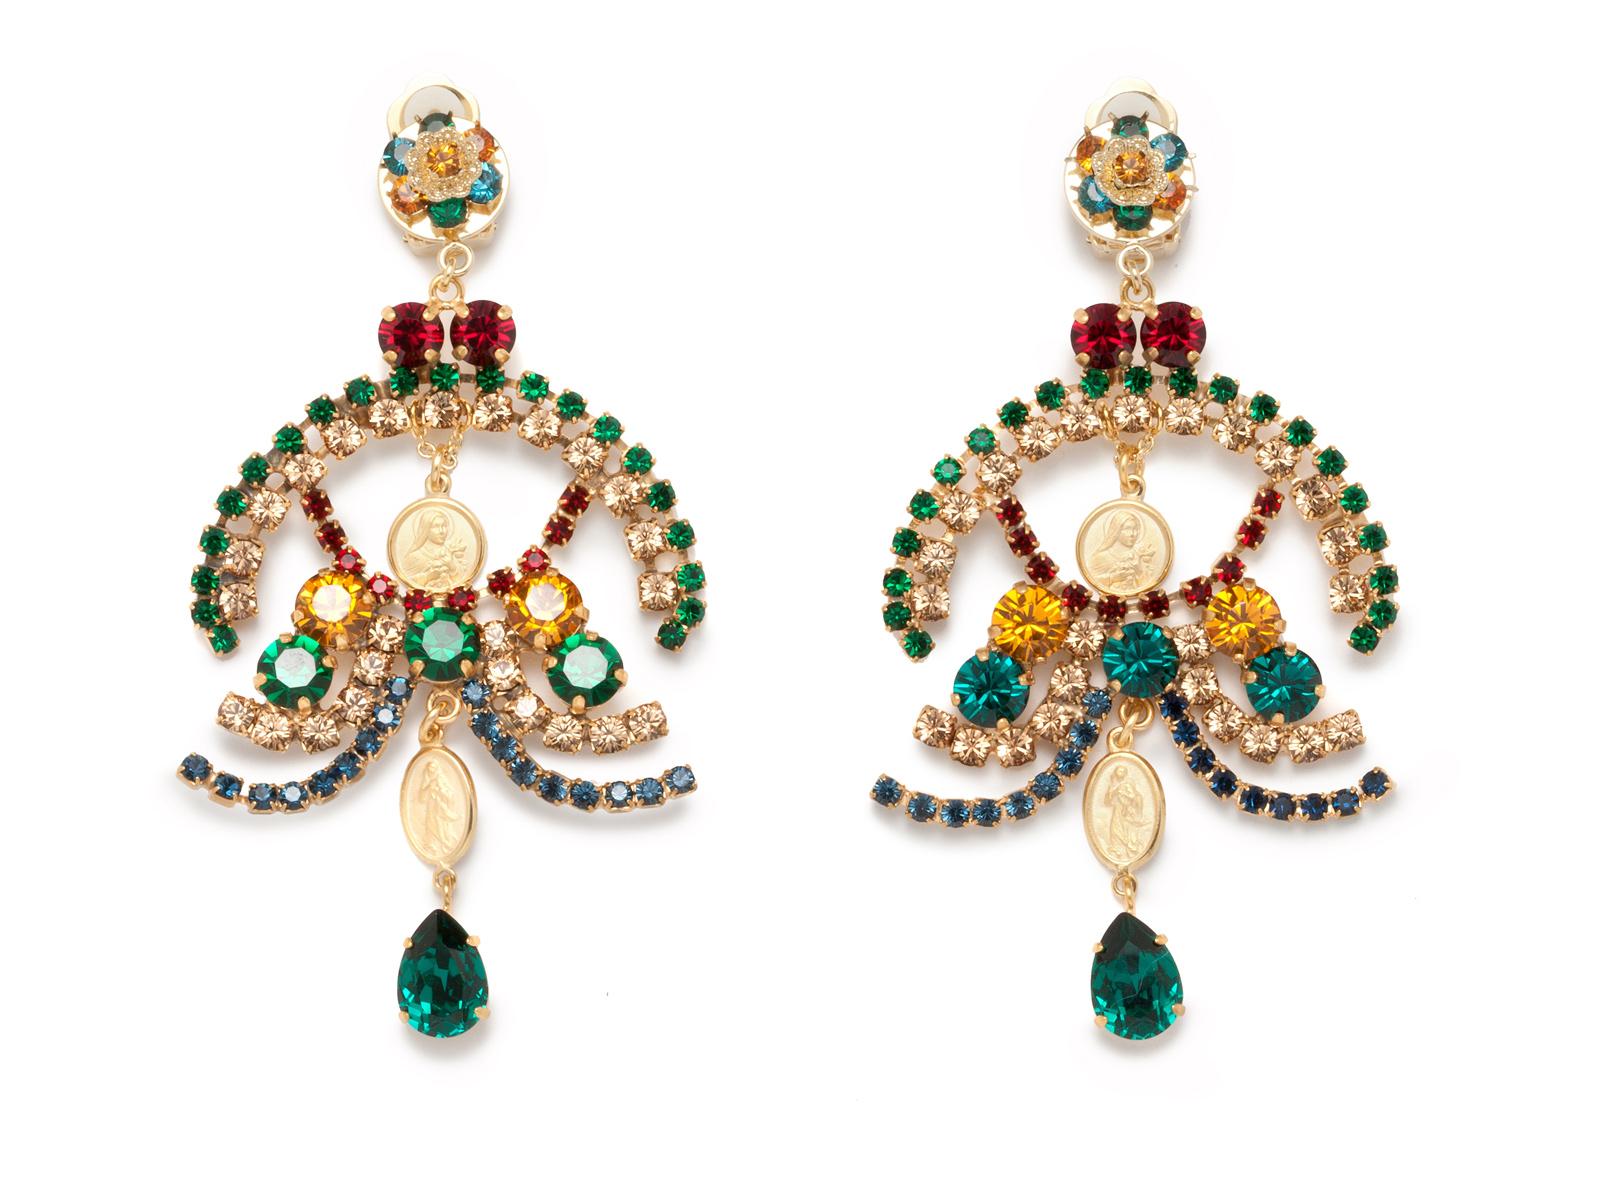 Серьги, Dolce & Gabbana  Третьяковский пр-д., 8, тел. (495) 933 3376